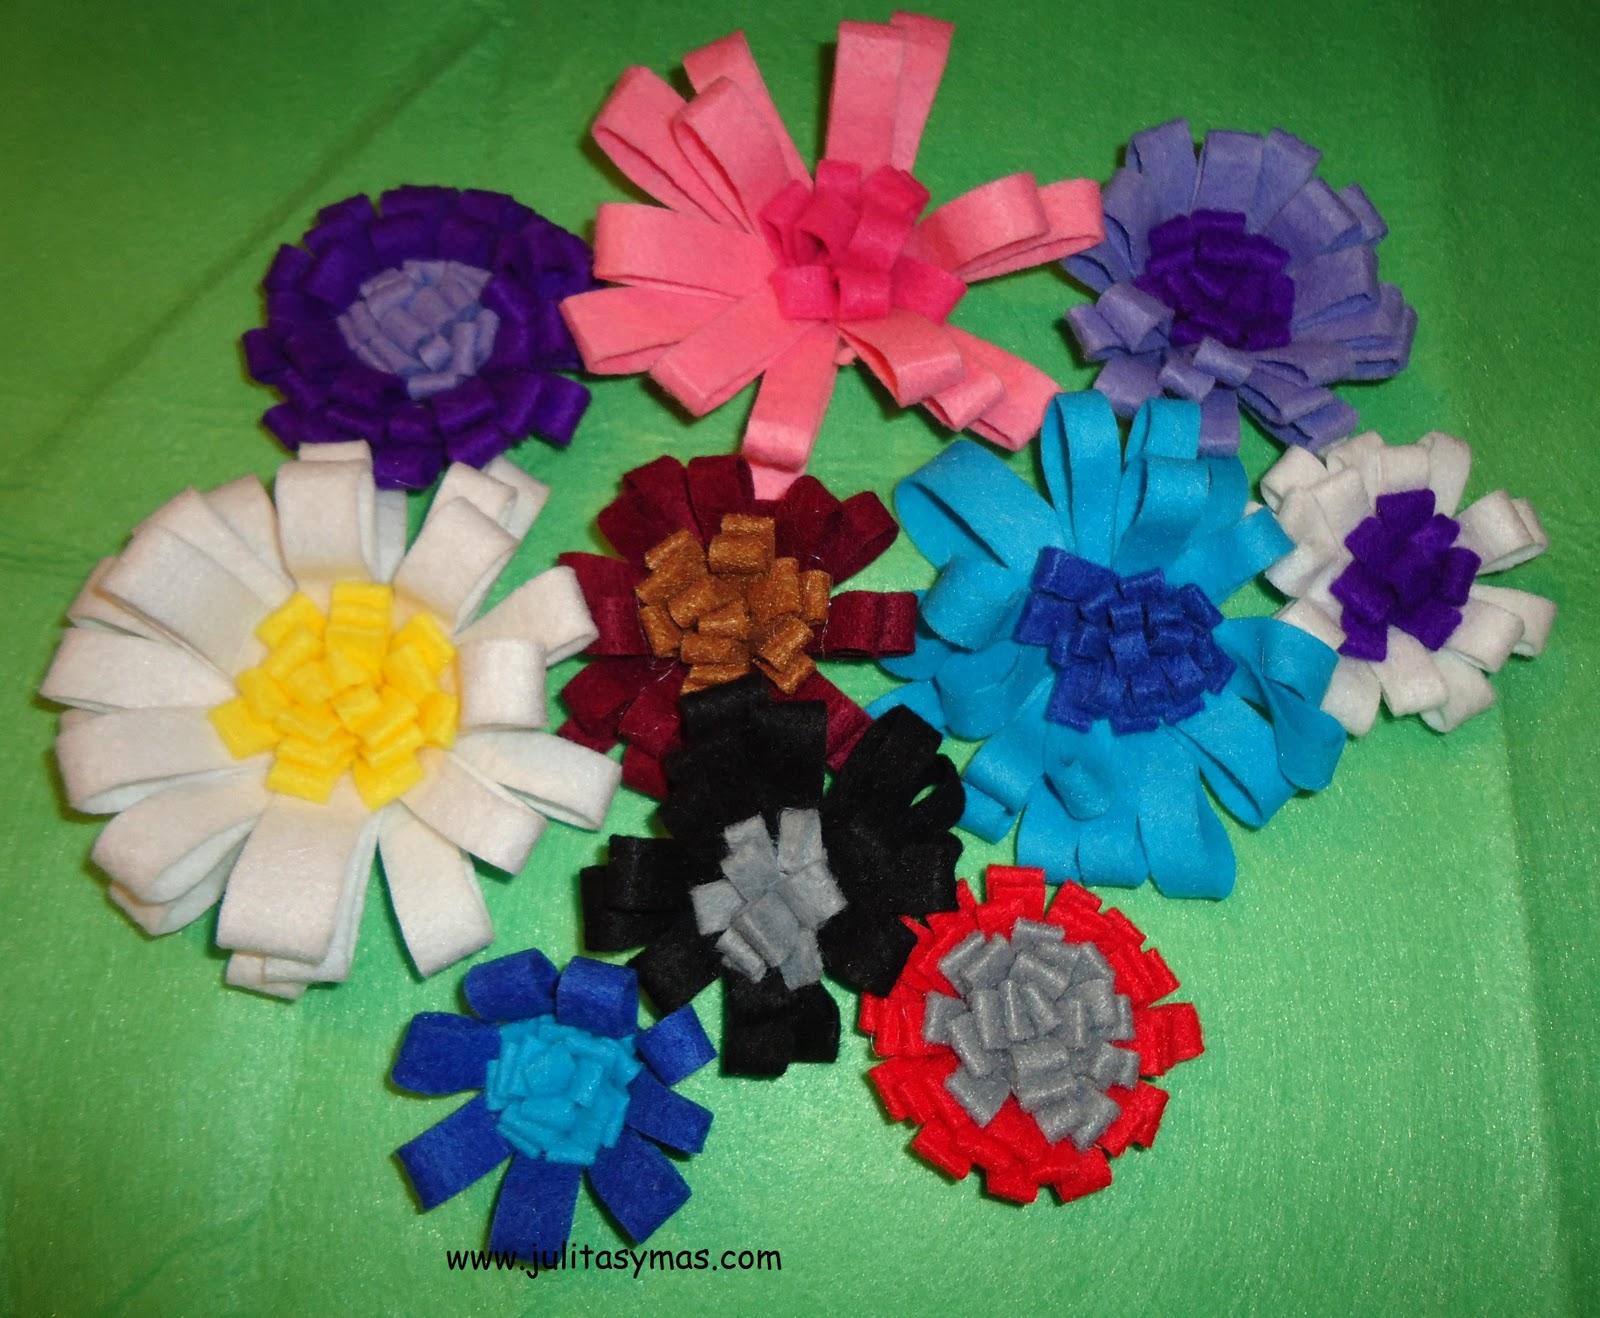 http://4.bp.blogspot.com/_uetC8ZHrlrI/TUsHgDhlzbI/AAAAAAAABik/M61E2JfBXgk/s1600/flores+de+fieltro+.JPG